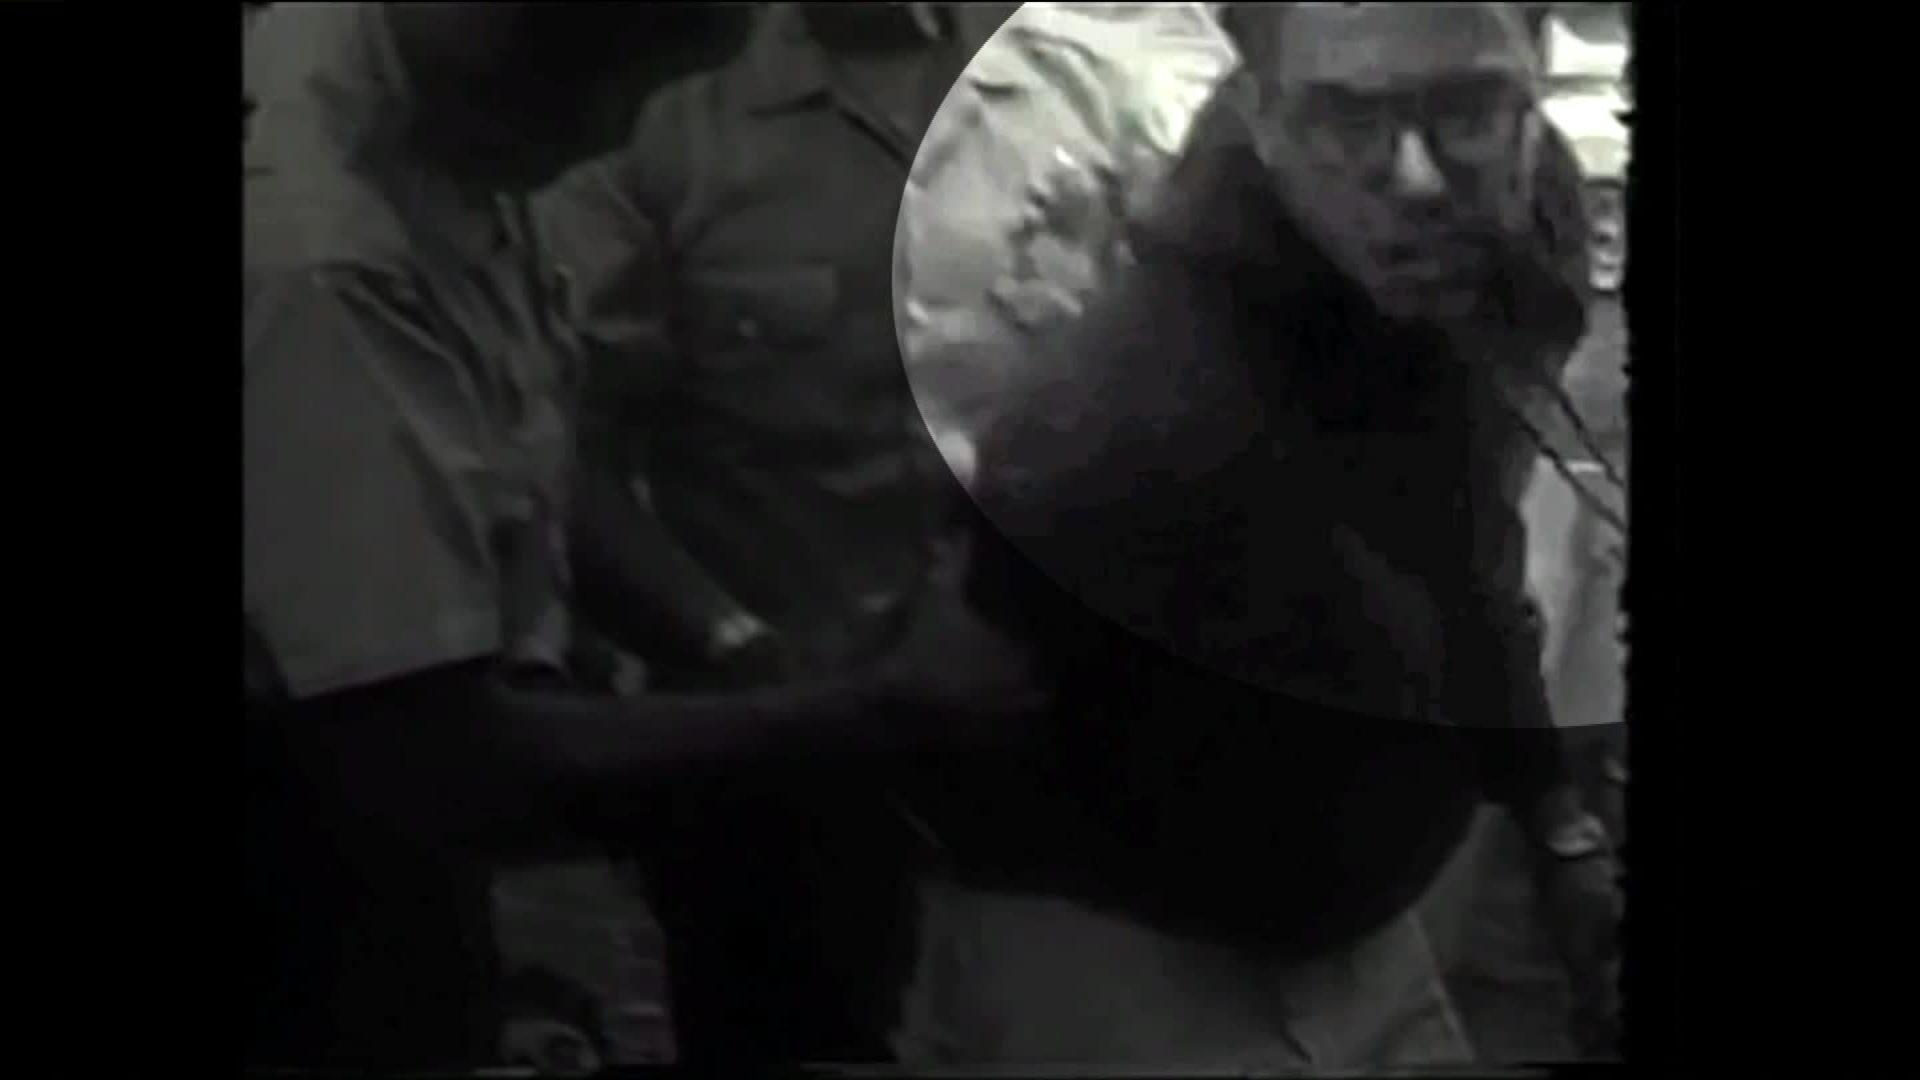 Bernie Sanders 1963 Arrest Video Surfaces Cnn Video